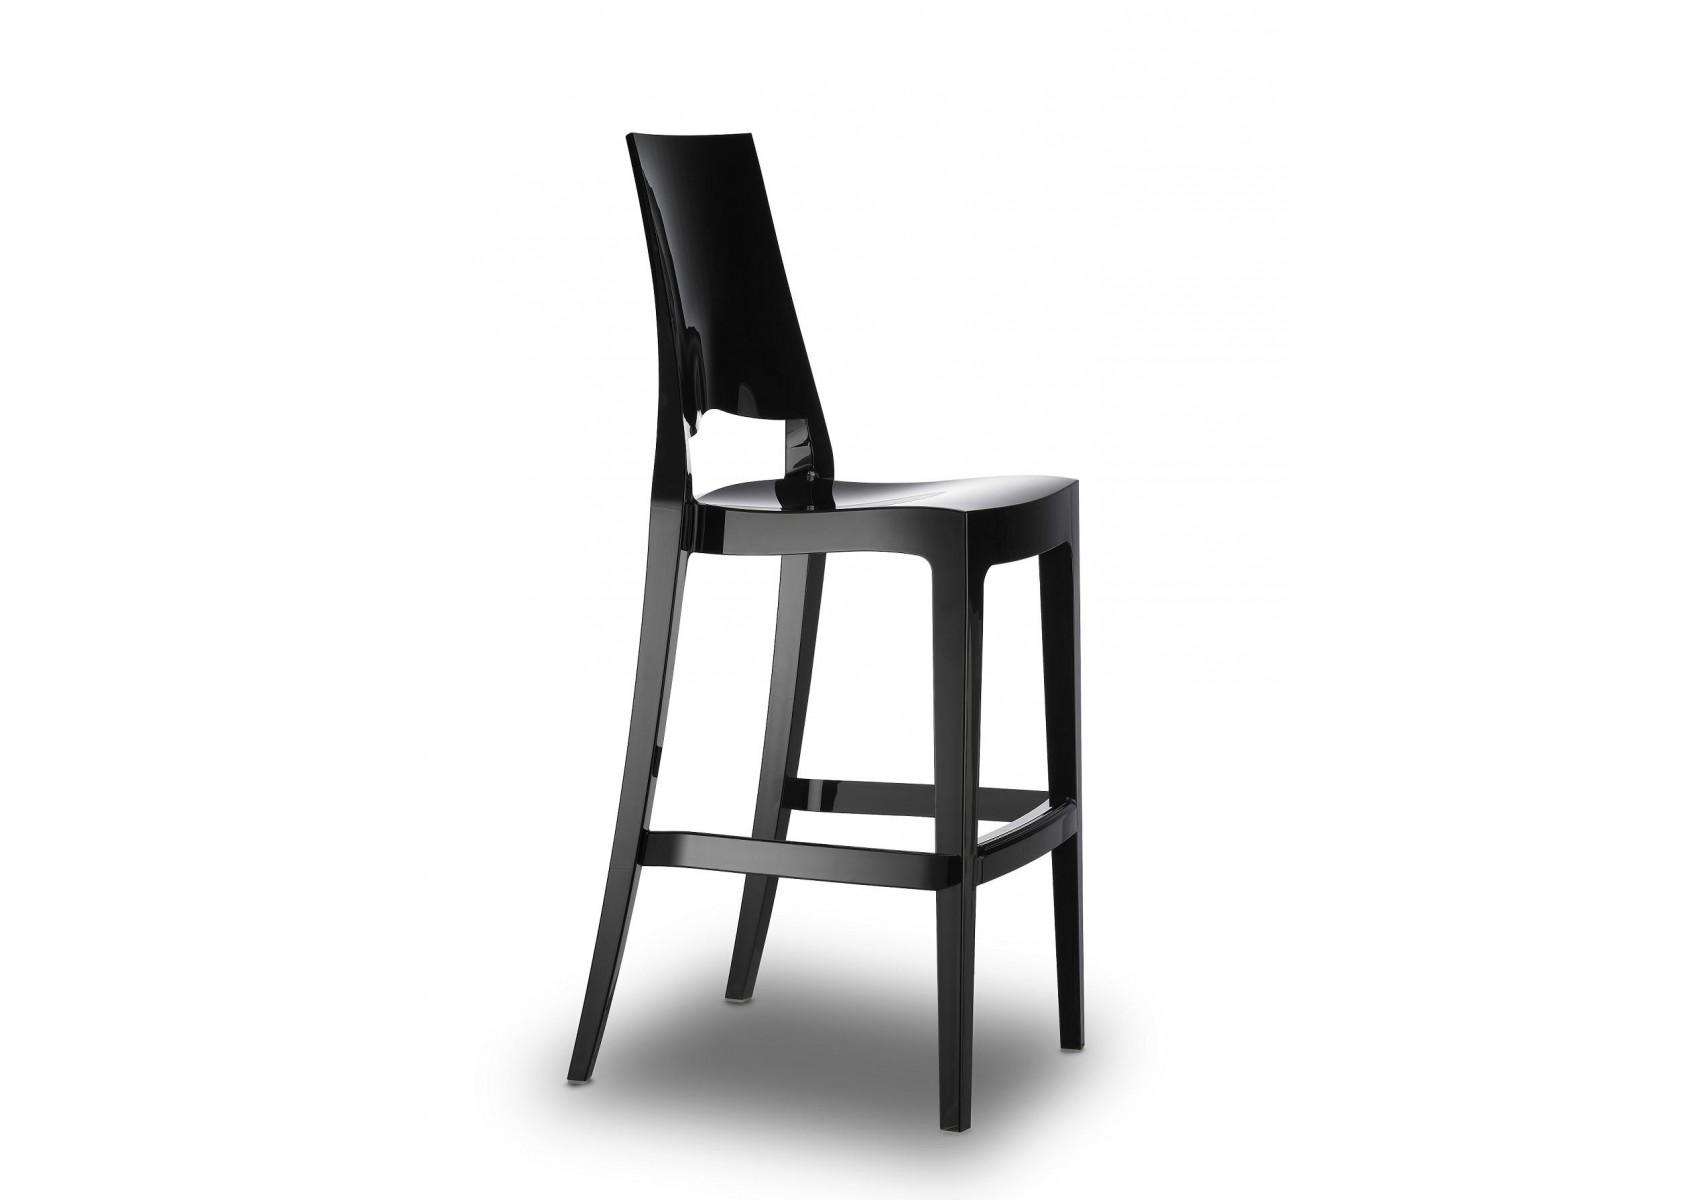 tabouret de bar design glenda barstool deco originale boite design. Black Bedroom Furniture Sets. Home Design Ideas